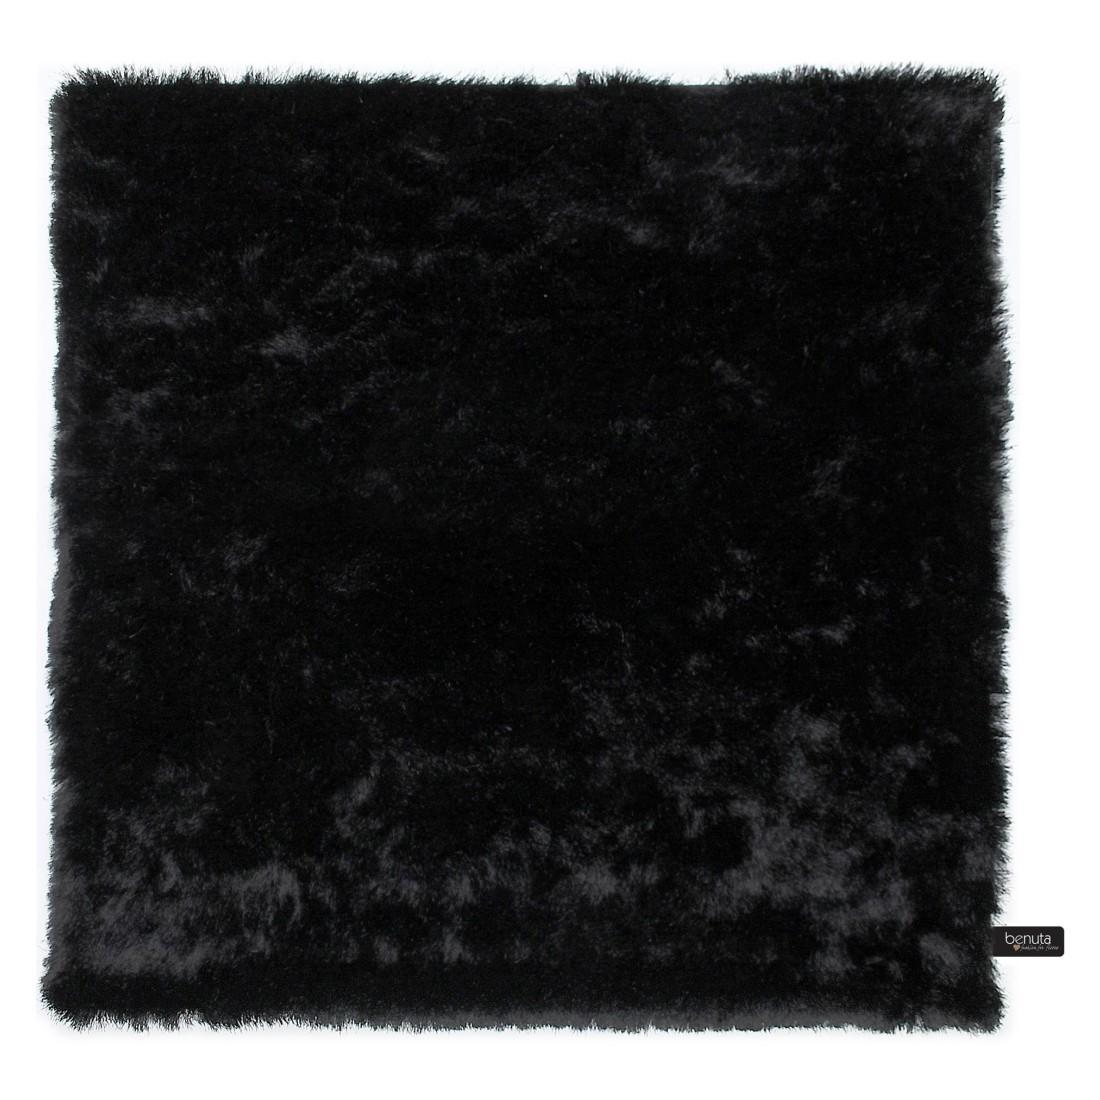 preisvergleich eu hochflor polyester teppich schwarz. Black Bedroom Furniture Sets. Home Design Ideas